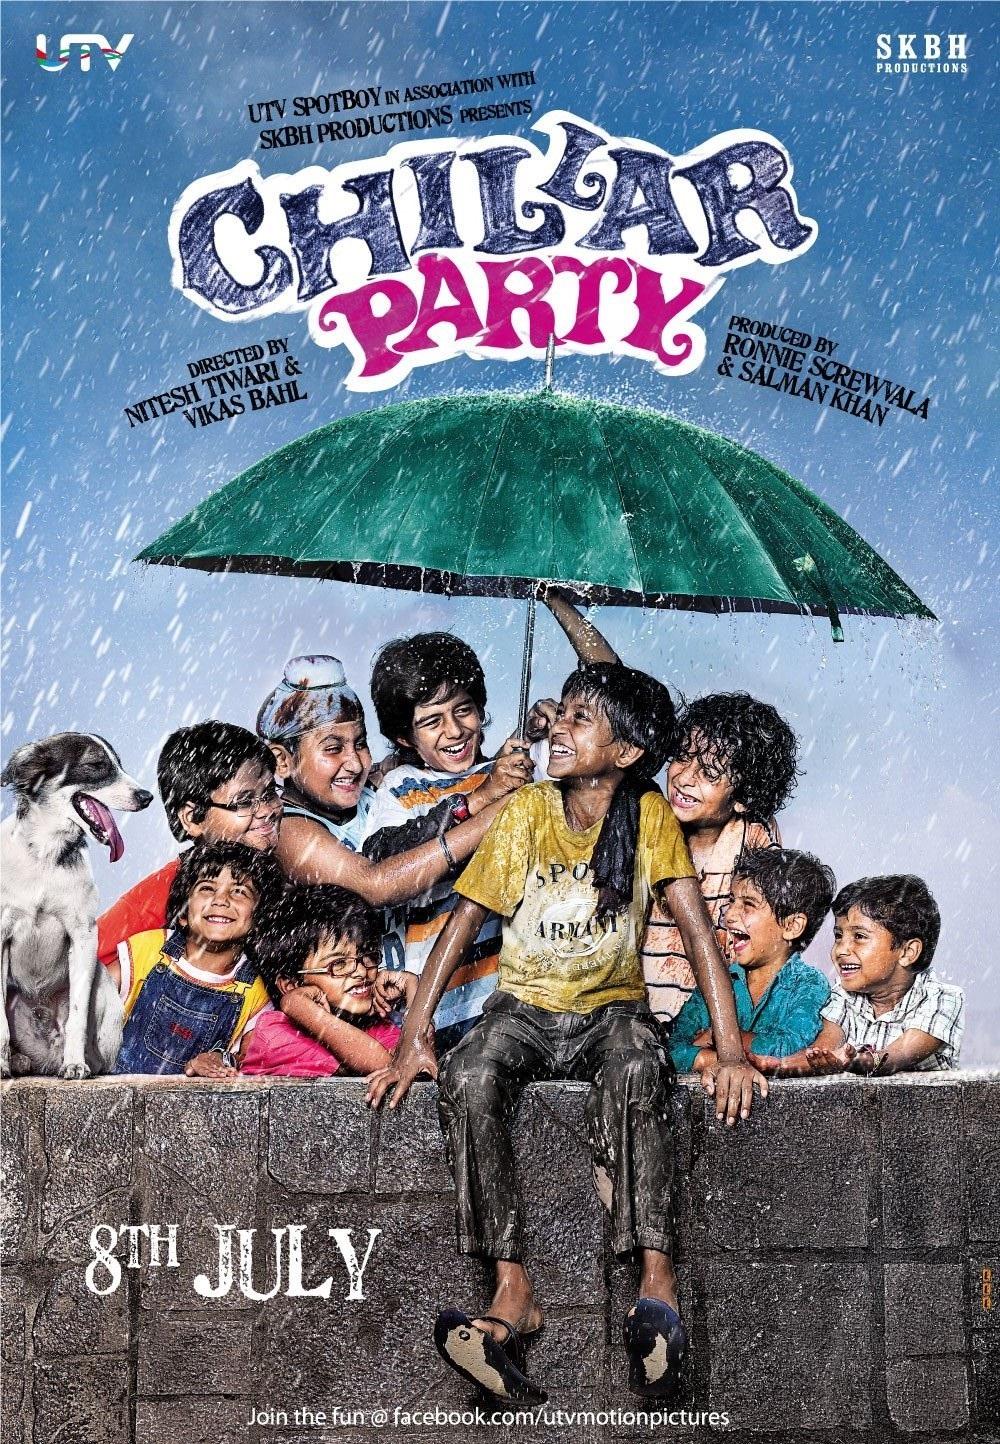 Photo Credit http://www.apunkachoice.com/dyn/movies/hindi/chillar_party/